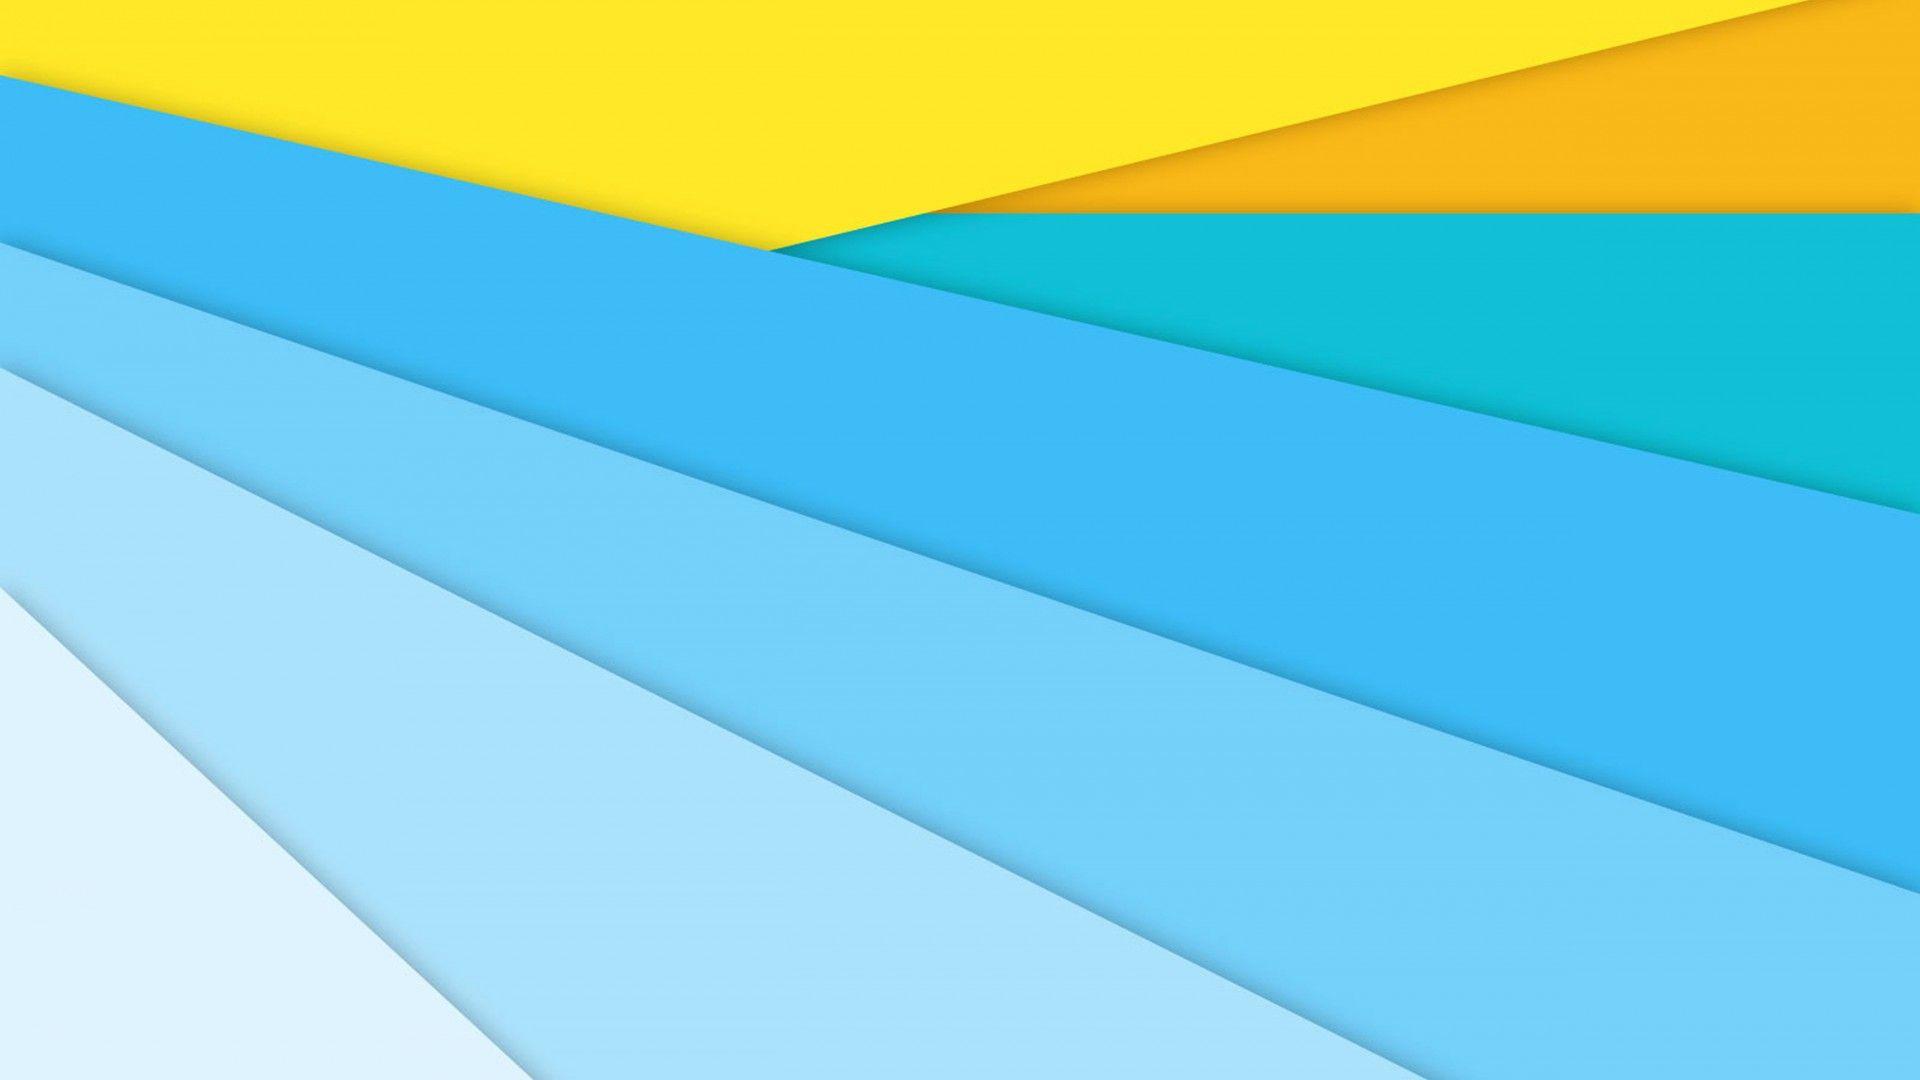 Material desktop background